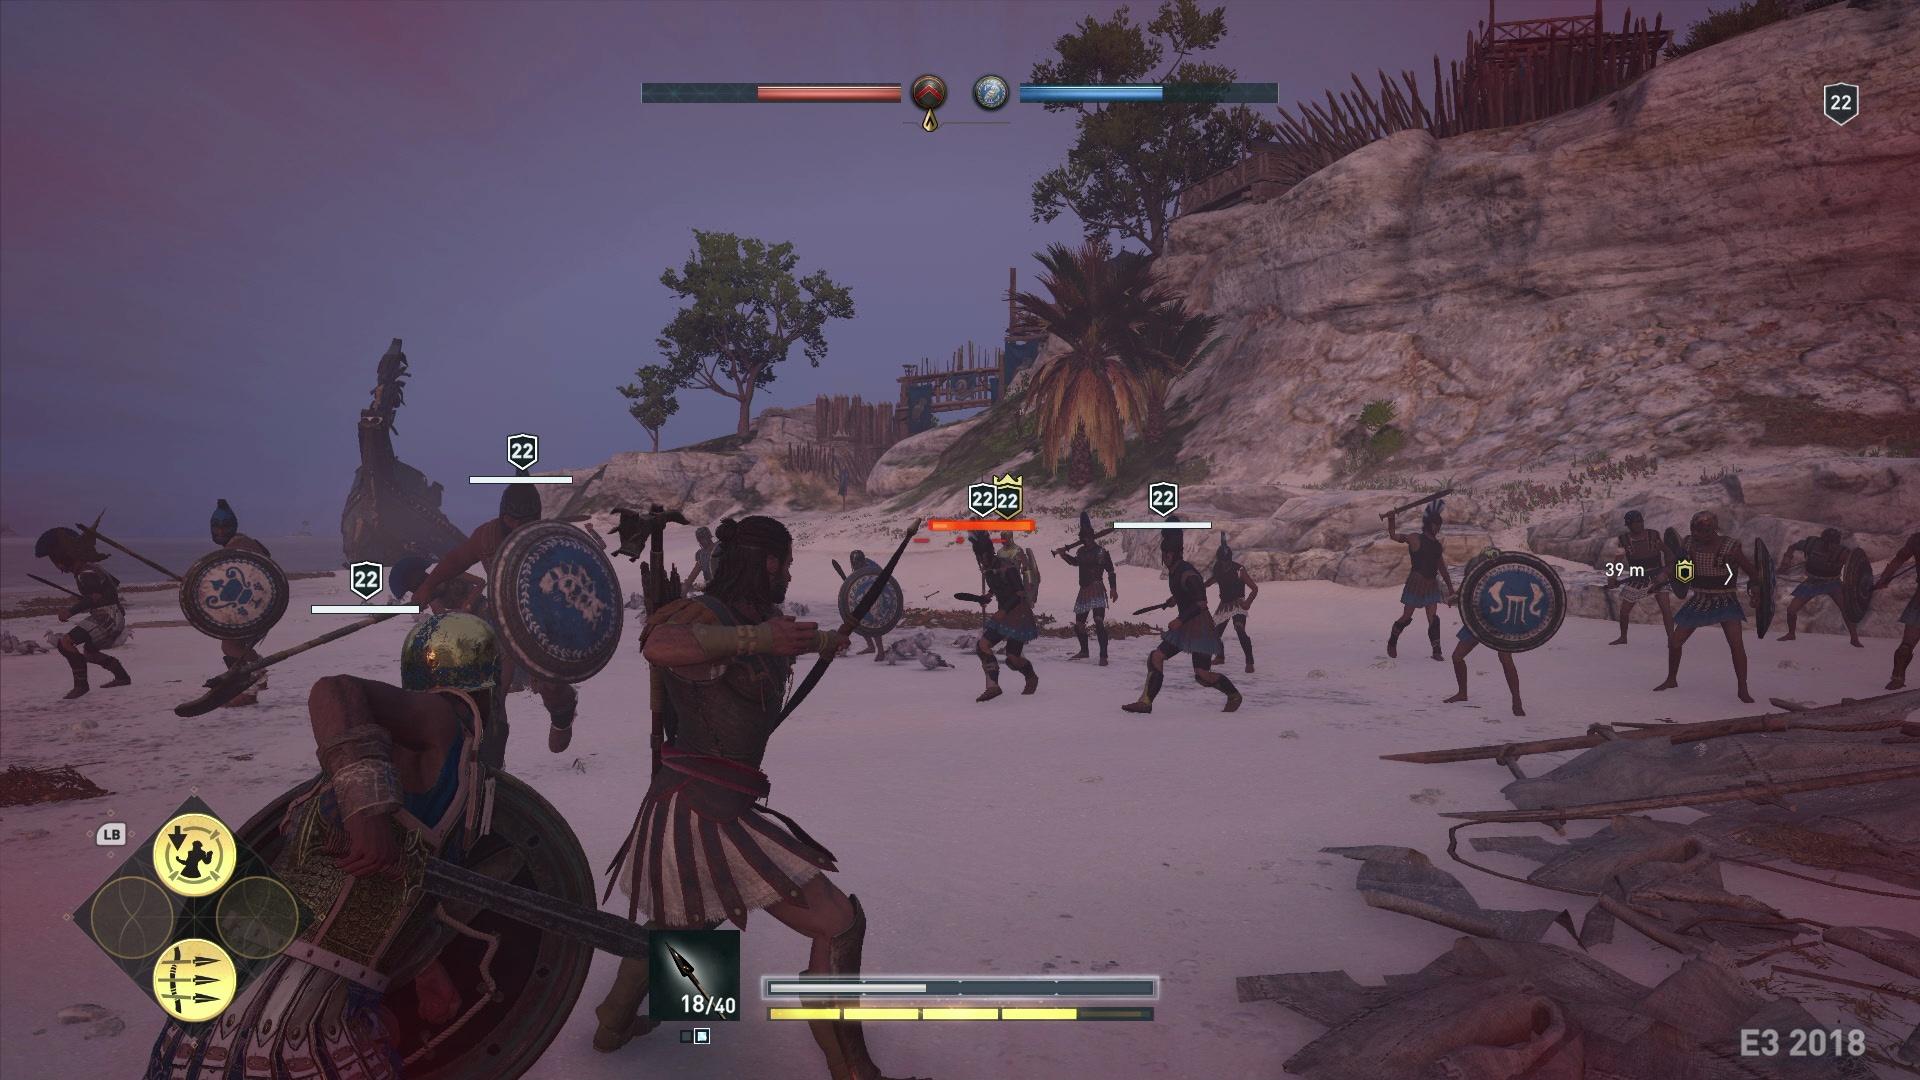 Assassins Creed Odyssey Leak 4